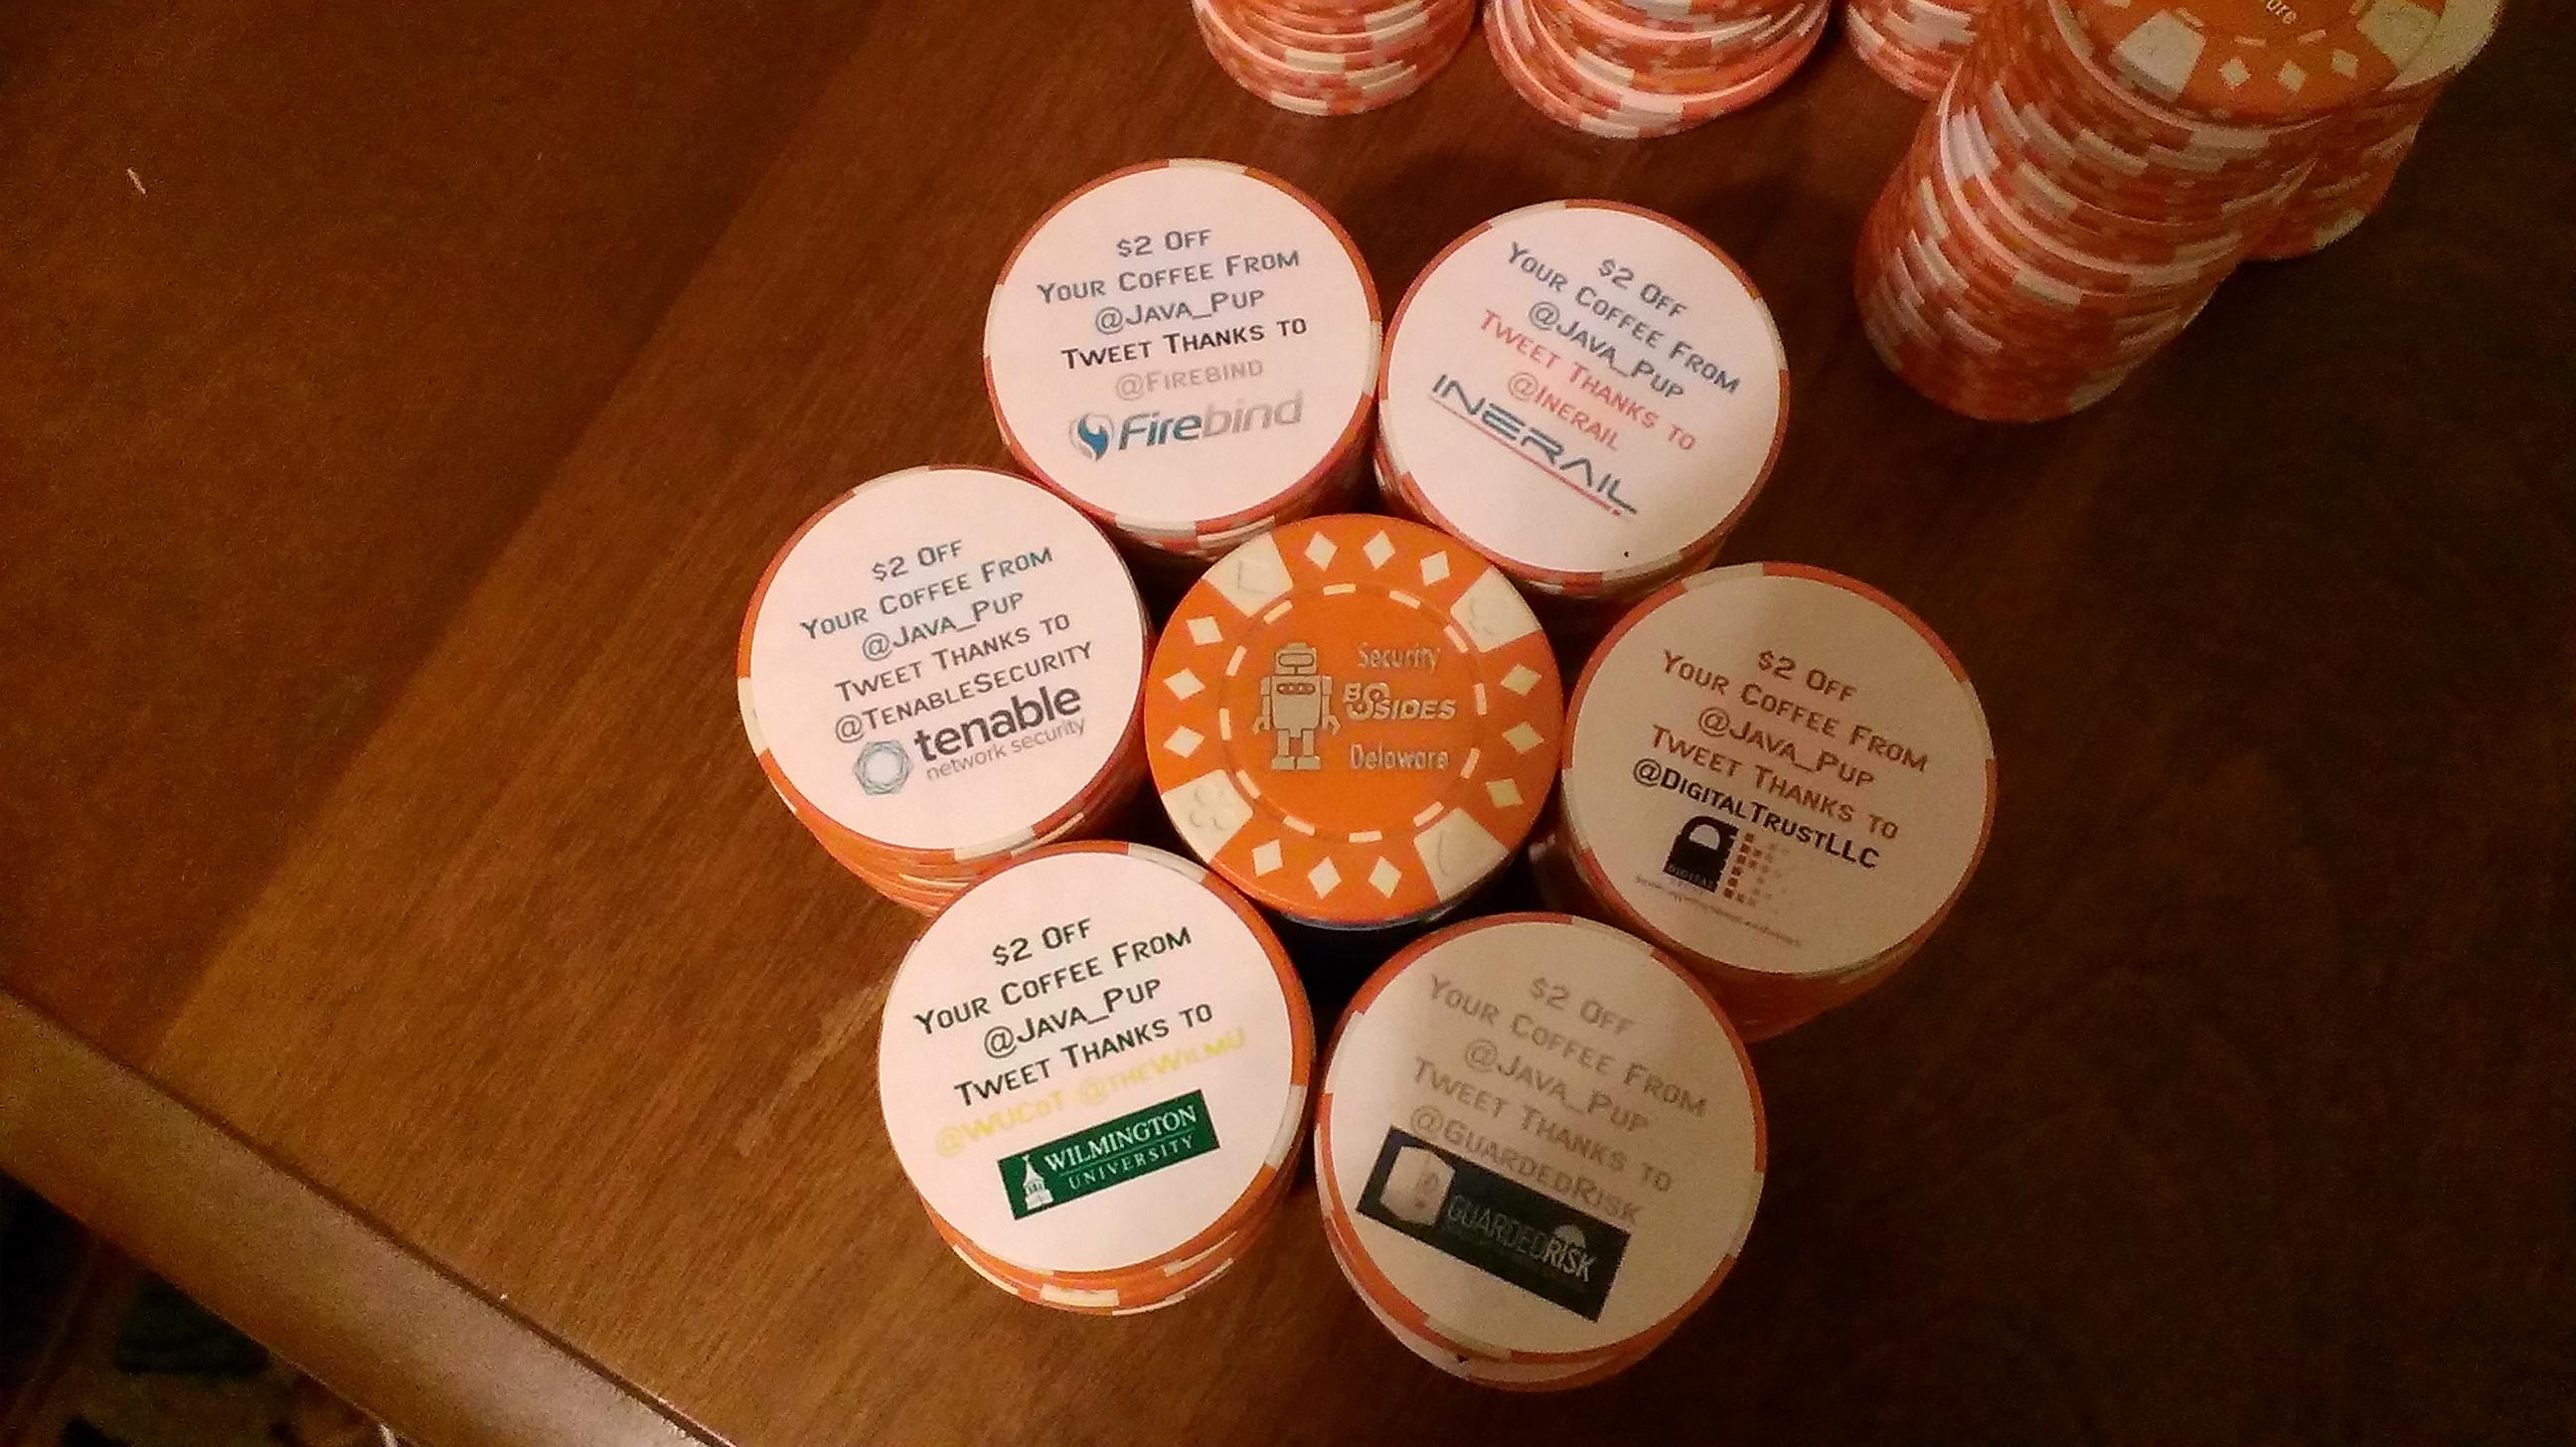 BSidesDE 2013 Coffee Poker Chips